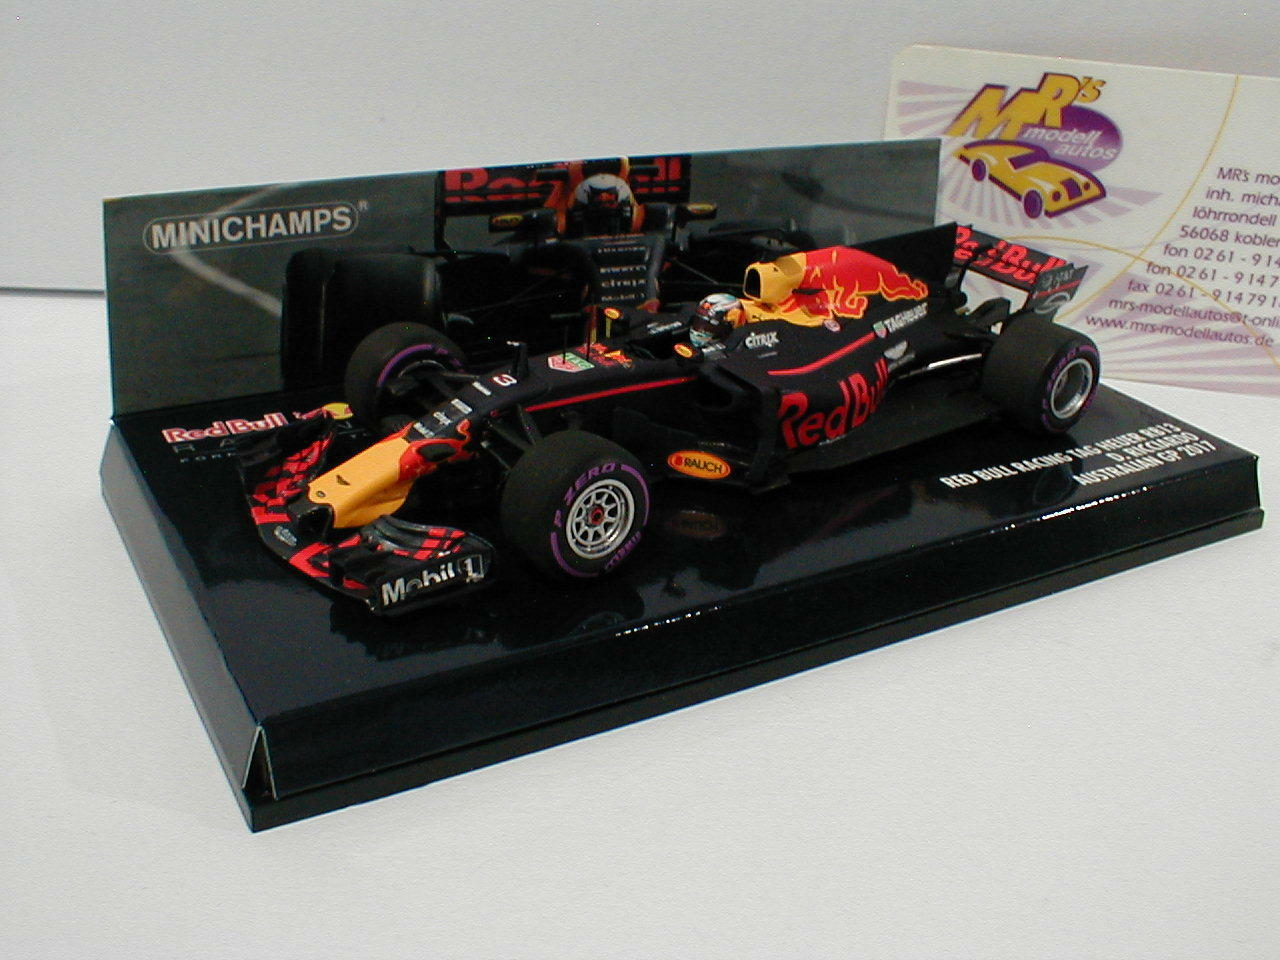 centro comercial de moda Minichamps Minichamps Minichamps 410170003-rojo bull rb13 No. 3 australia gp f1 2017 D. Ricciardo 1 43  venta mundialmente famosa en línea